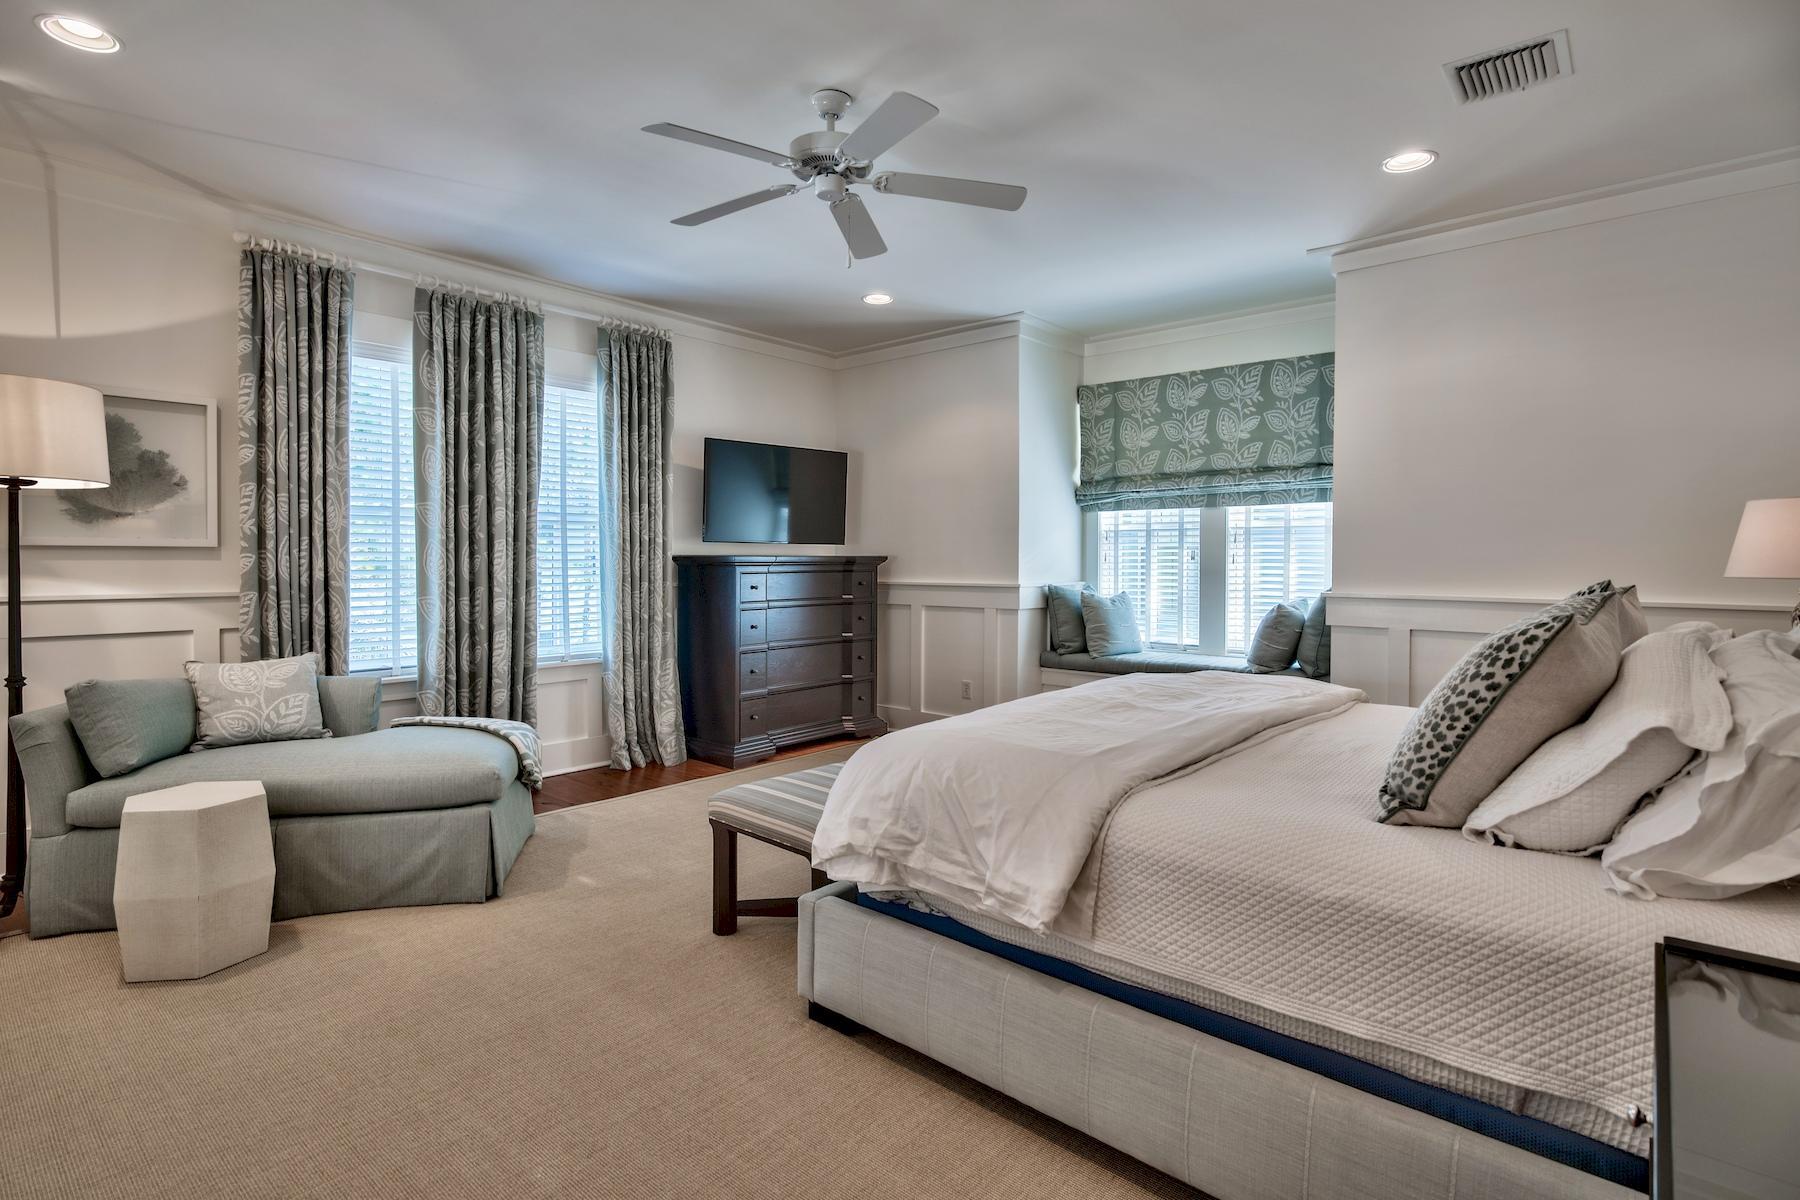 164 Pond Cypress,Santa Rosa Beach,Florida 32459,4 Bedrooms Bedrooms,4 BathroomsBathrooms,Detached single family,Pond Cypress,20131126143817002353000000